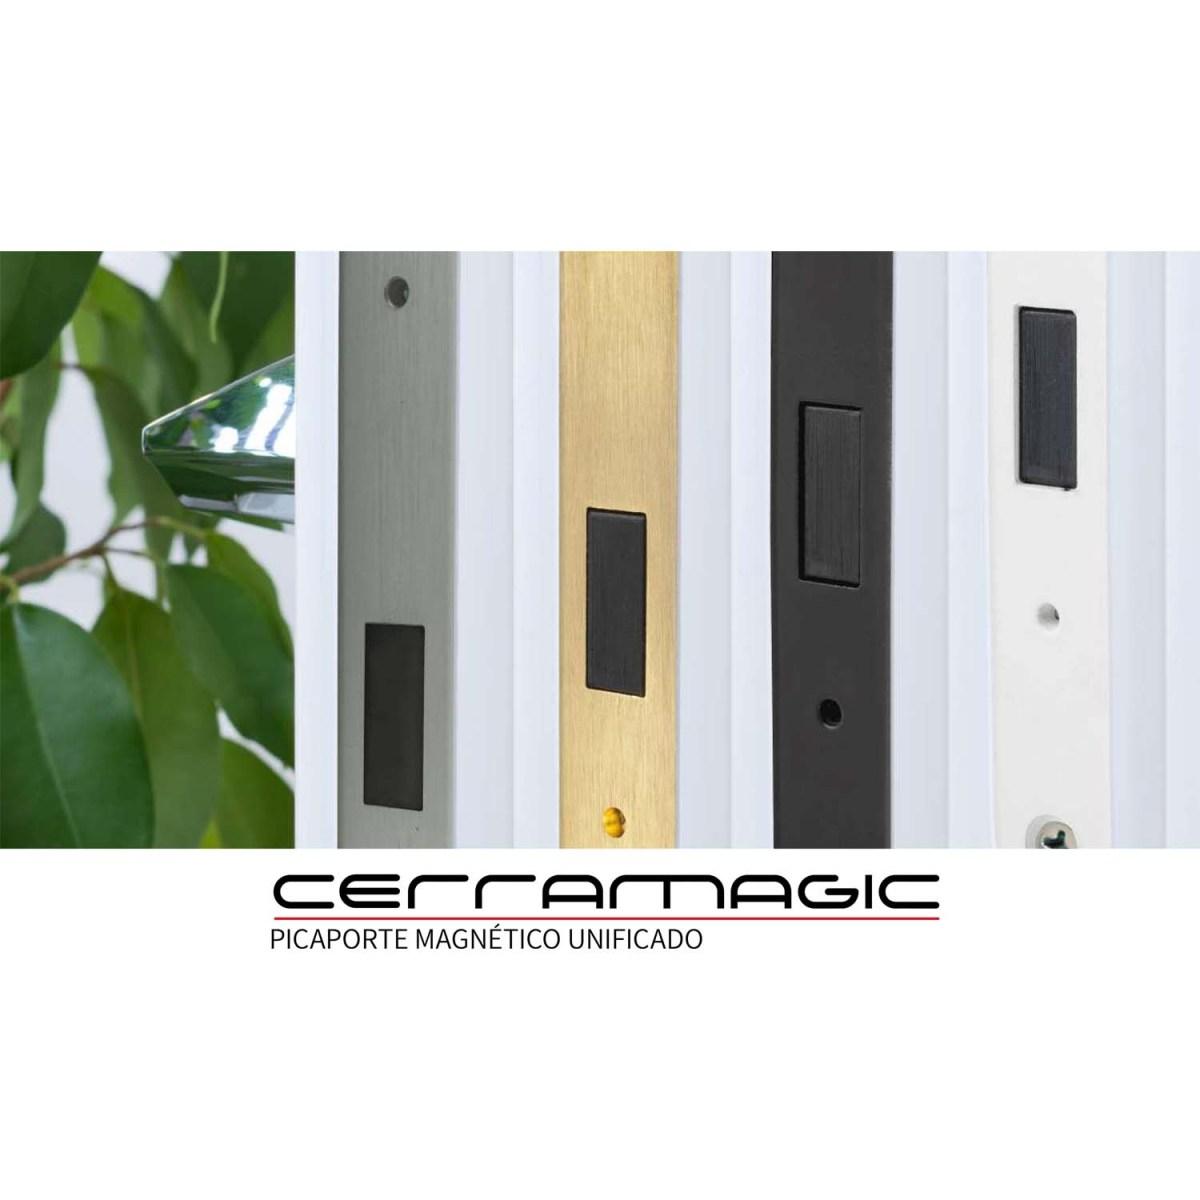 cerramagic-picaporte- magnético- unificado- 819